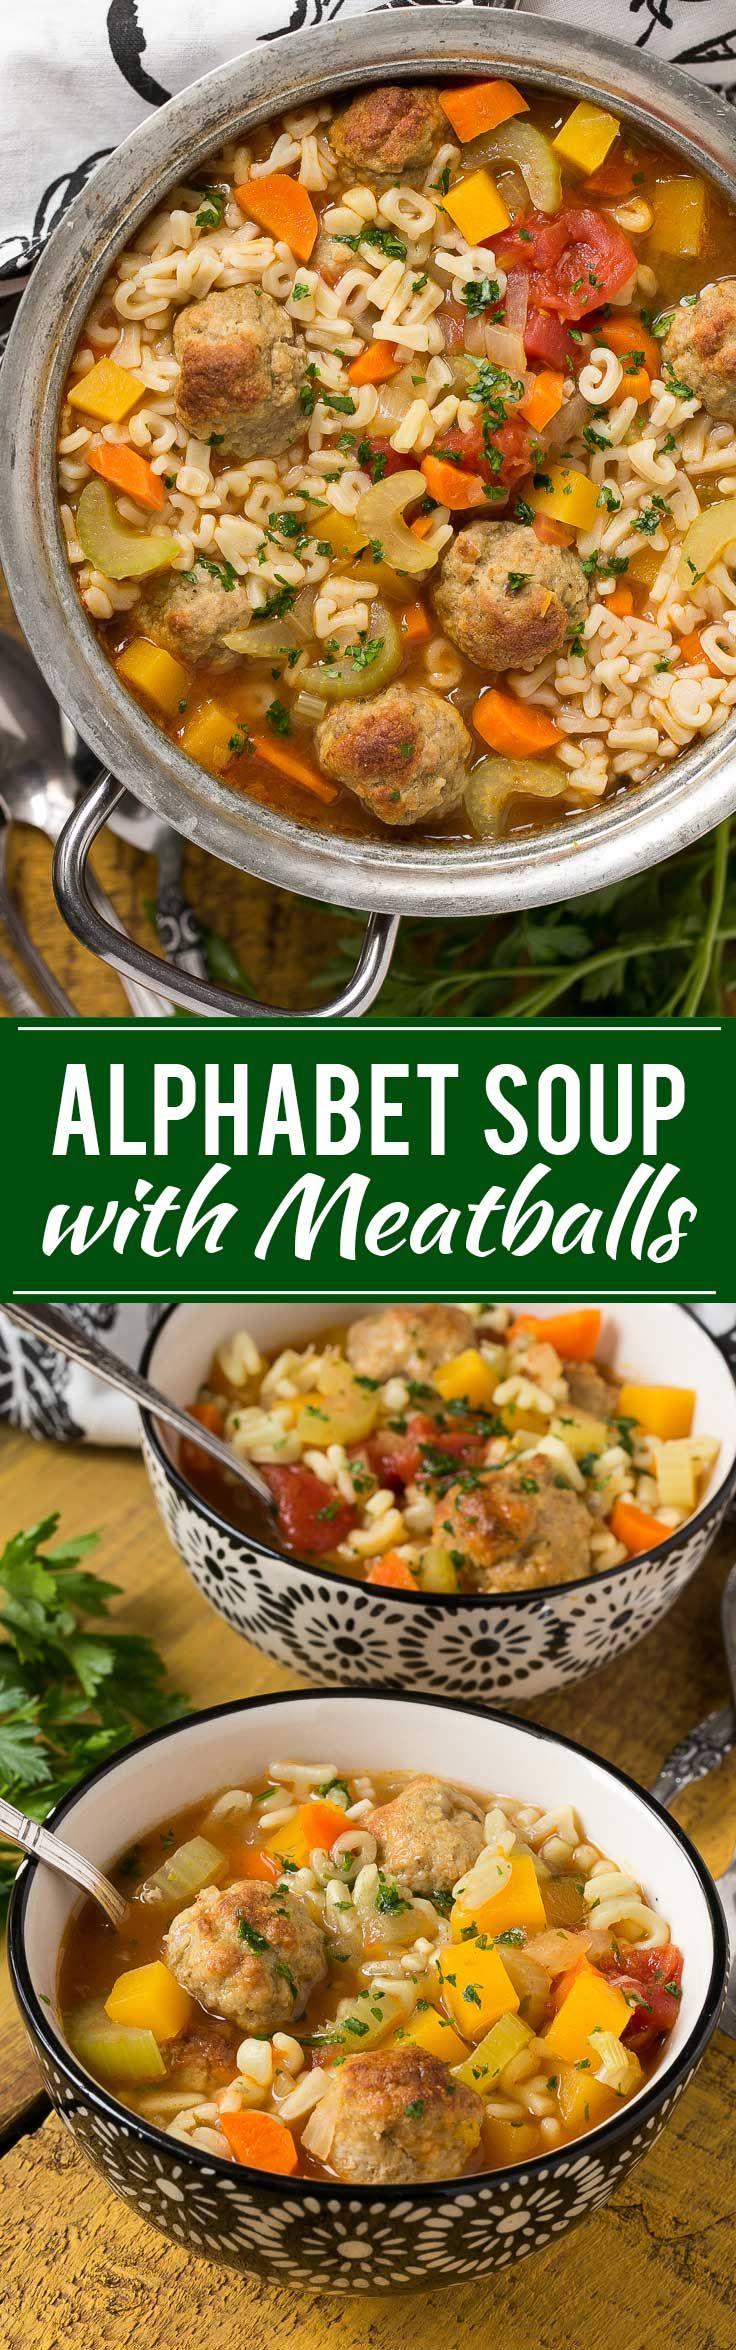 Alphabet Soup with Meatballs